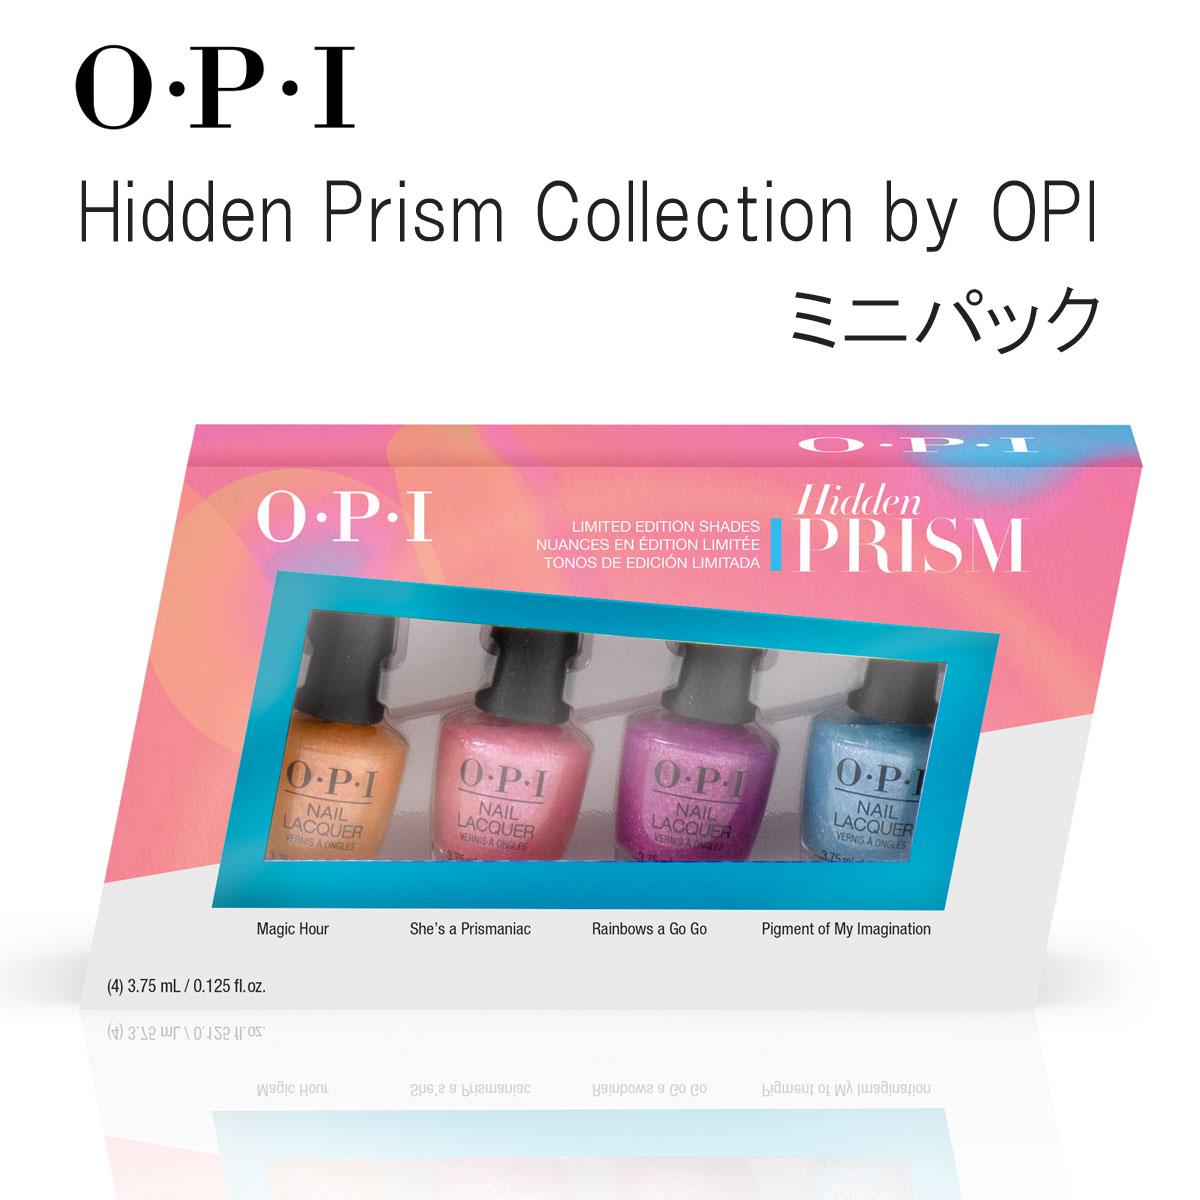 OPI オーピーアイ NL ヒドゥン プリズム コレクション バイ オーピーアイ ミニパック 各3.75ml SR2 SR3 SR4 SR5 ミニボトル